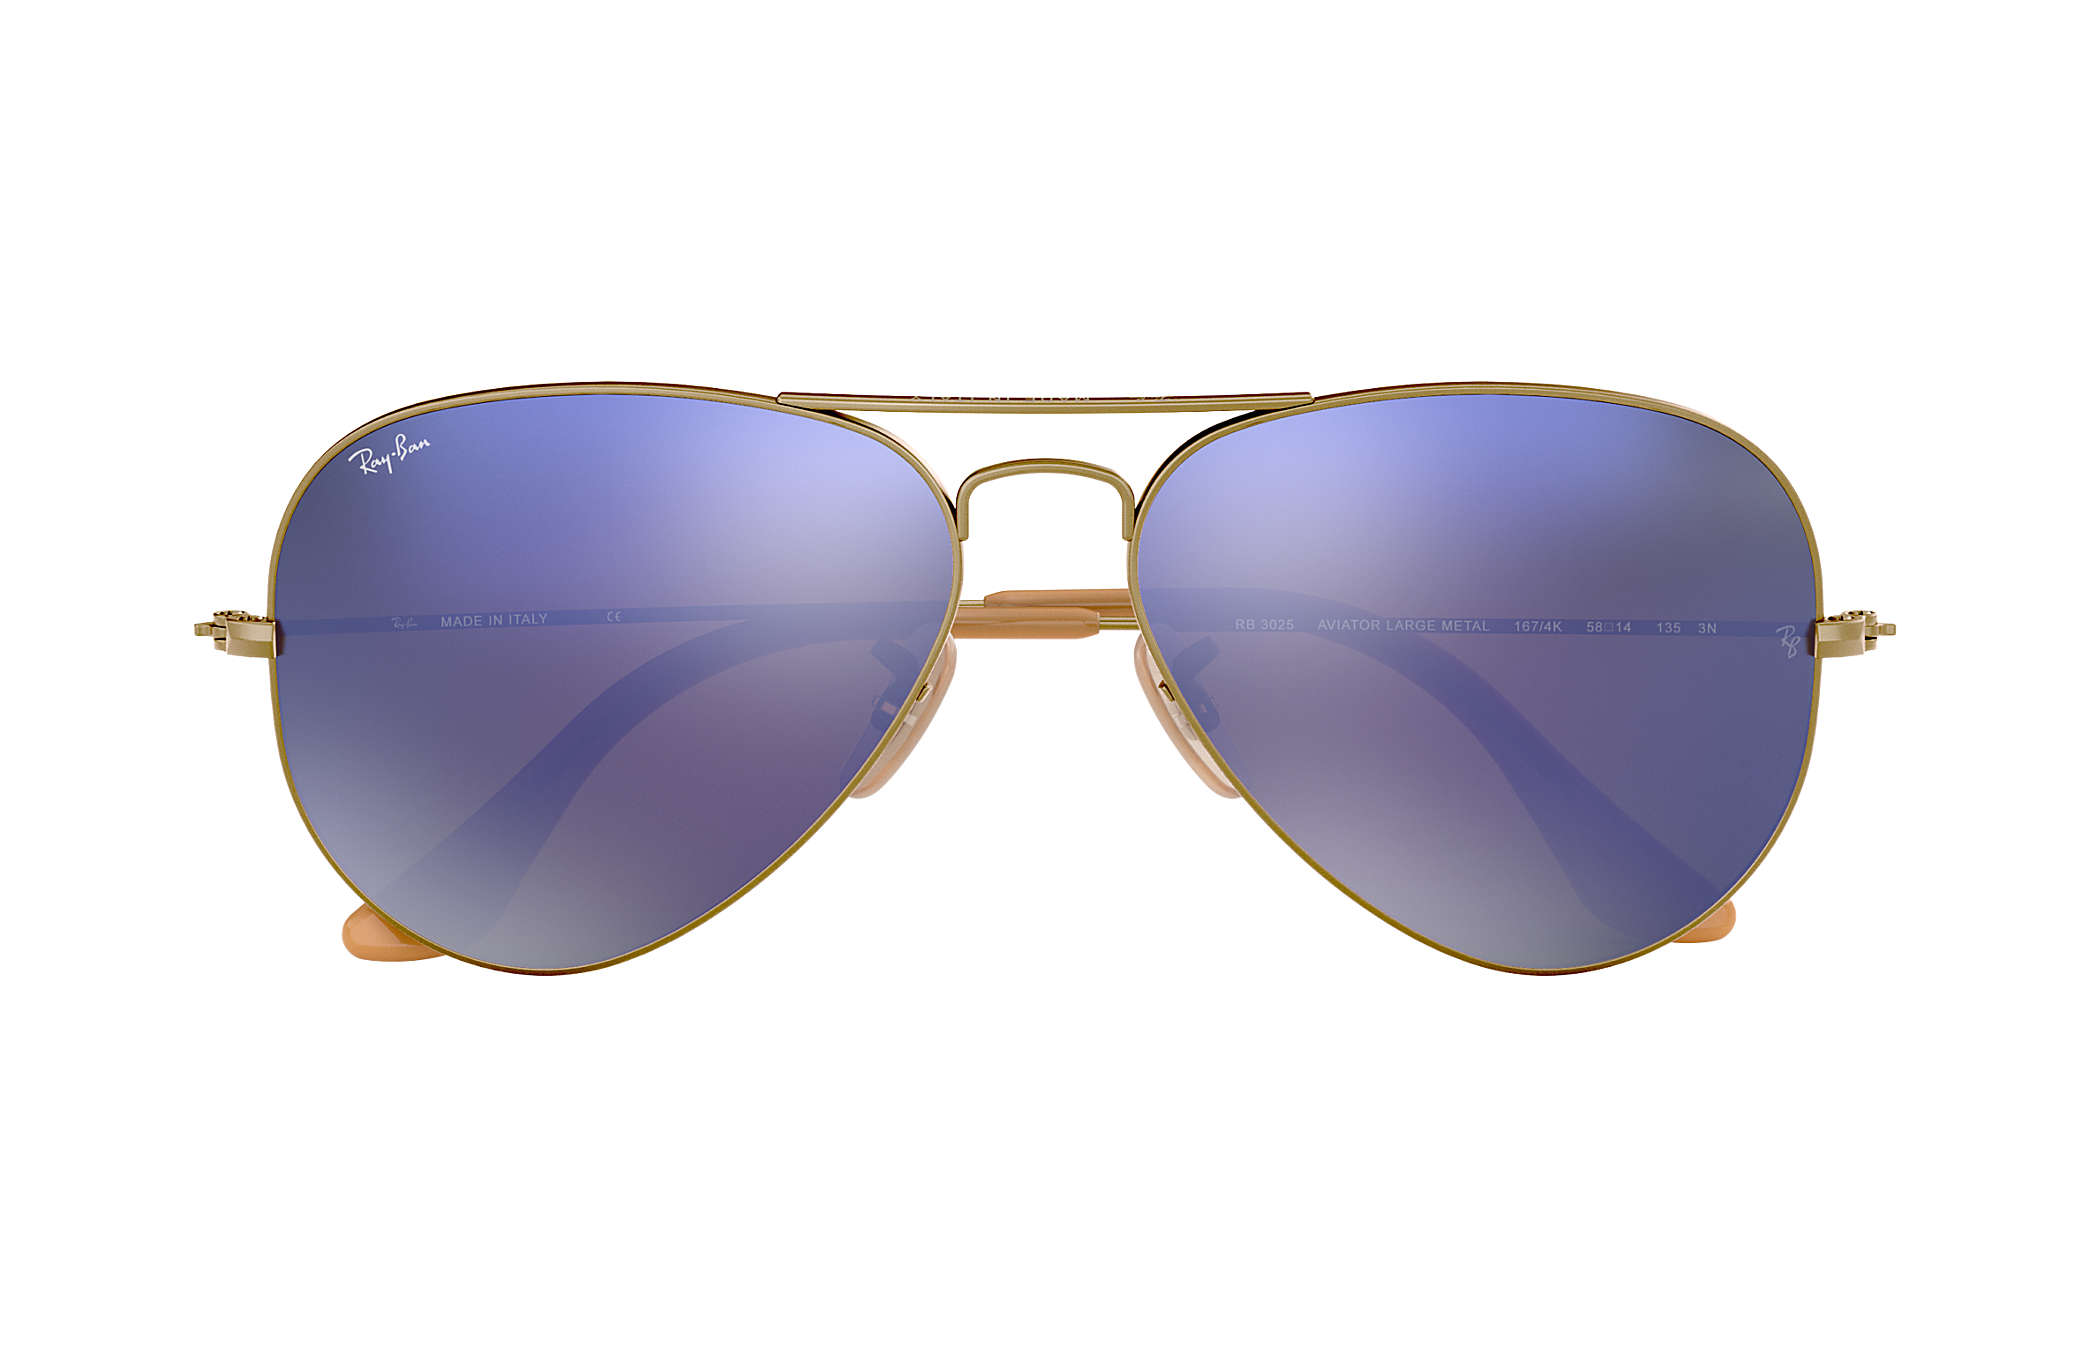 a4d6b90925e3 Ray-Ban Aviator Flash Lenses RB3025 Bronze-Copper - Metal - Lilac ...